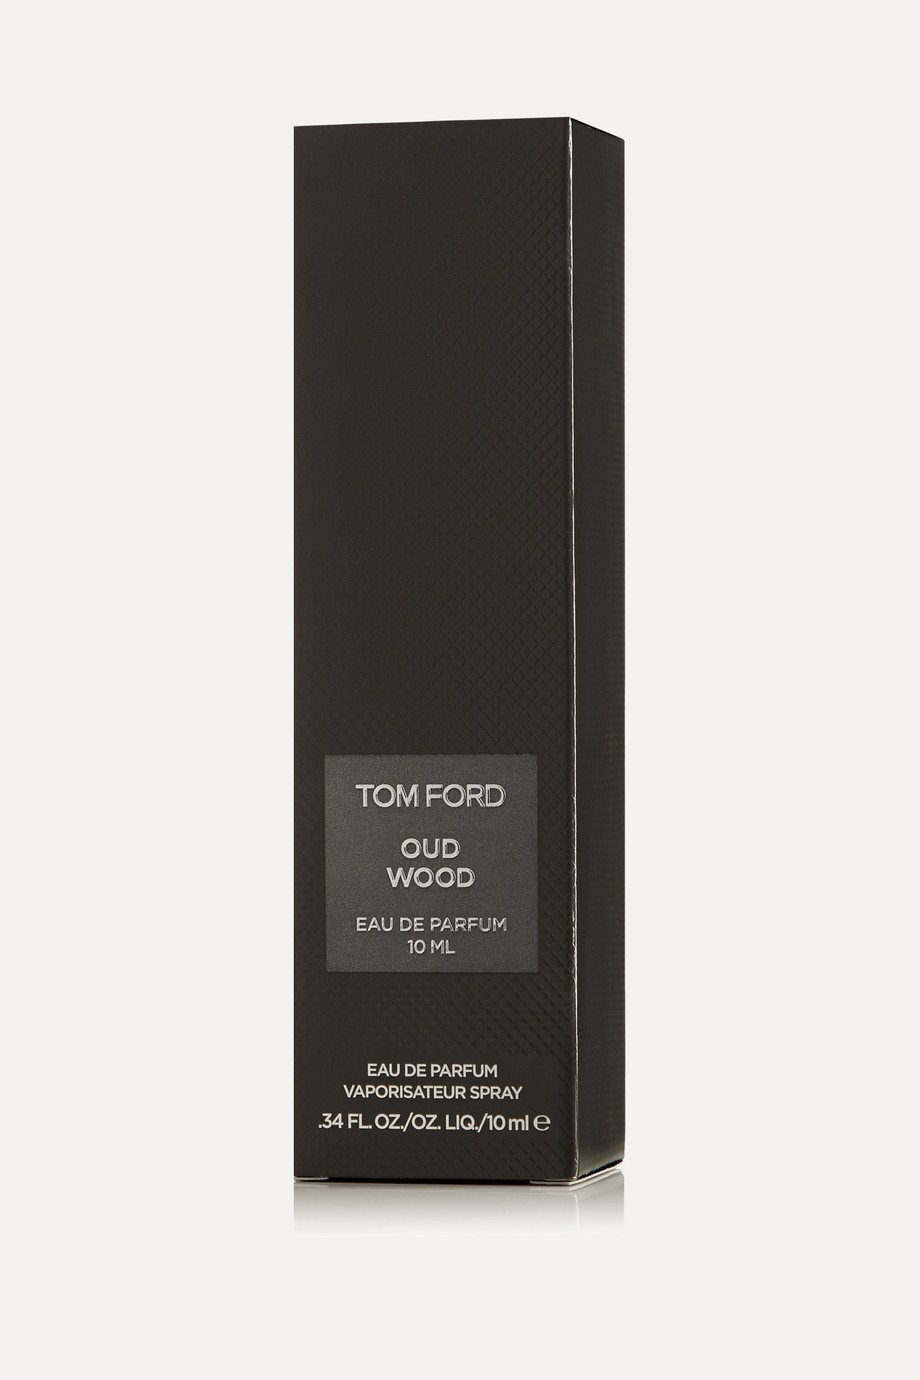 TOM FORD BEAUTY Oud Wood Eau de Parfum, 10ml